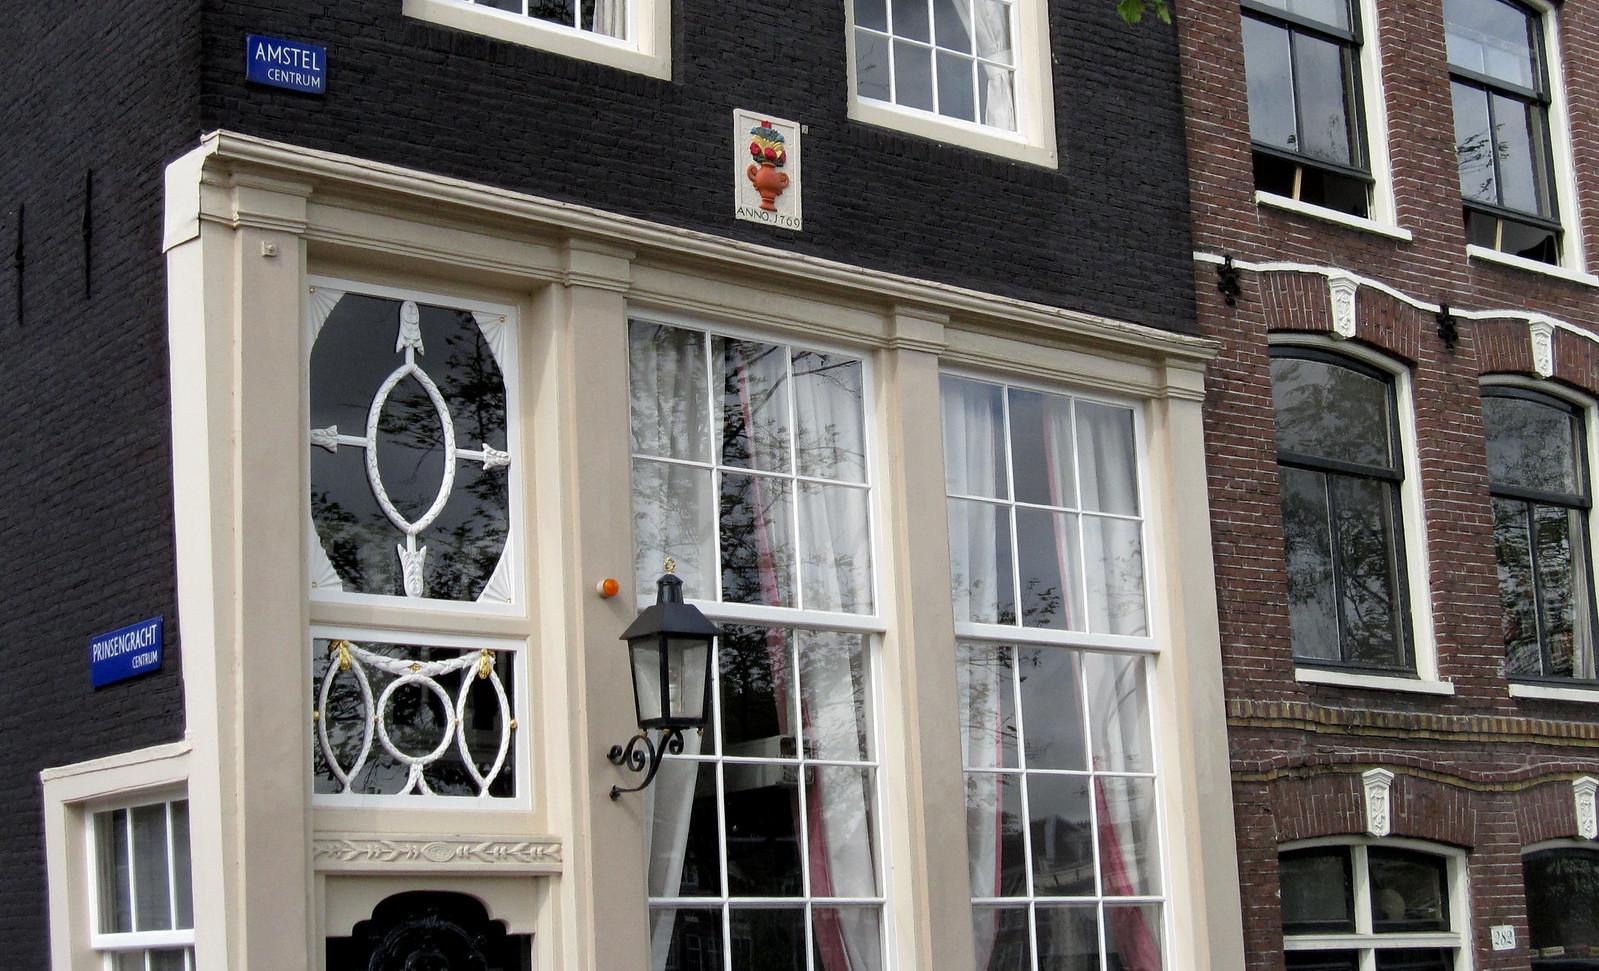 Amsterdam 602